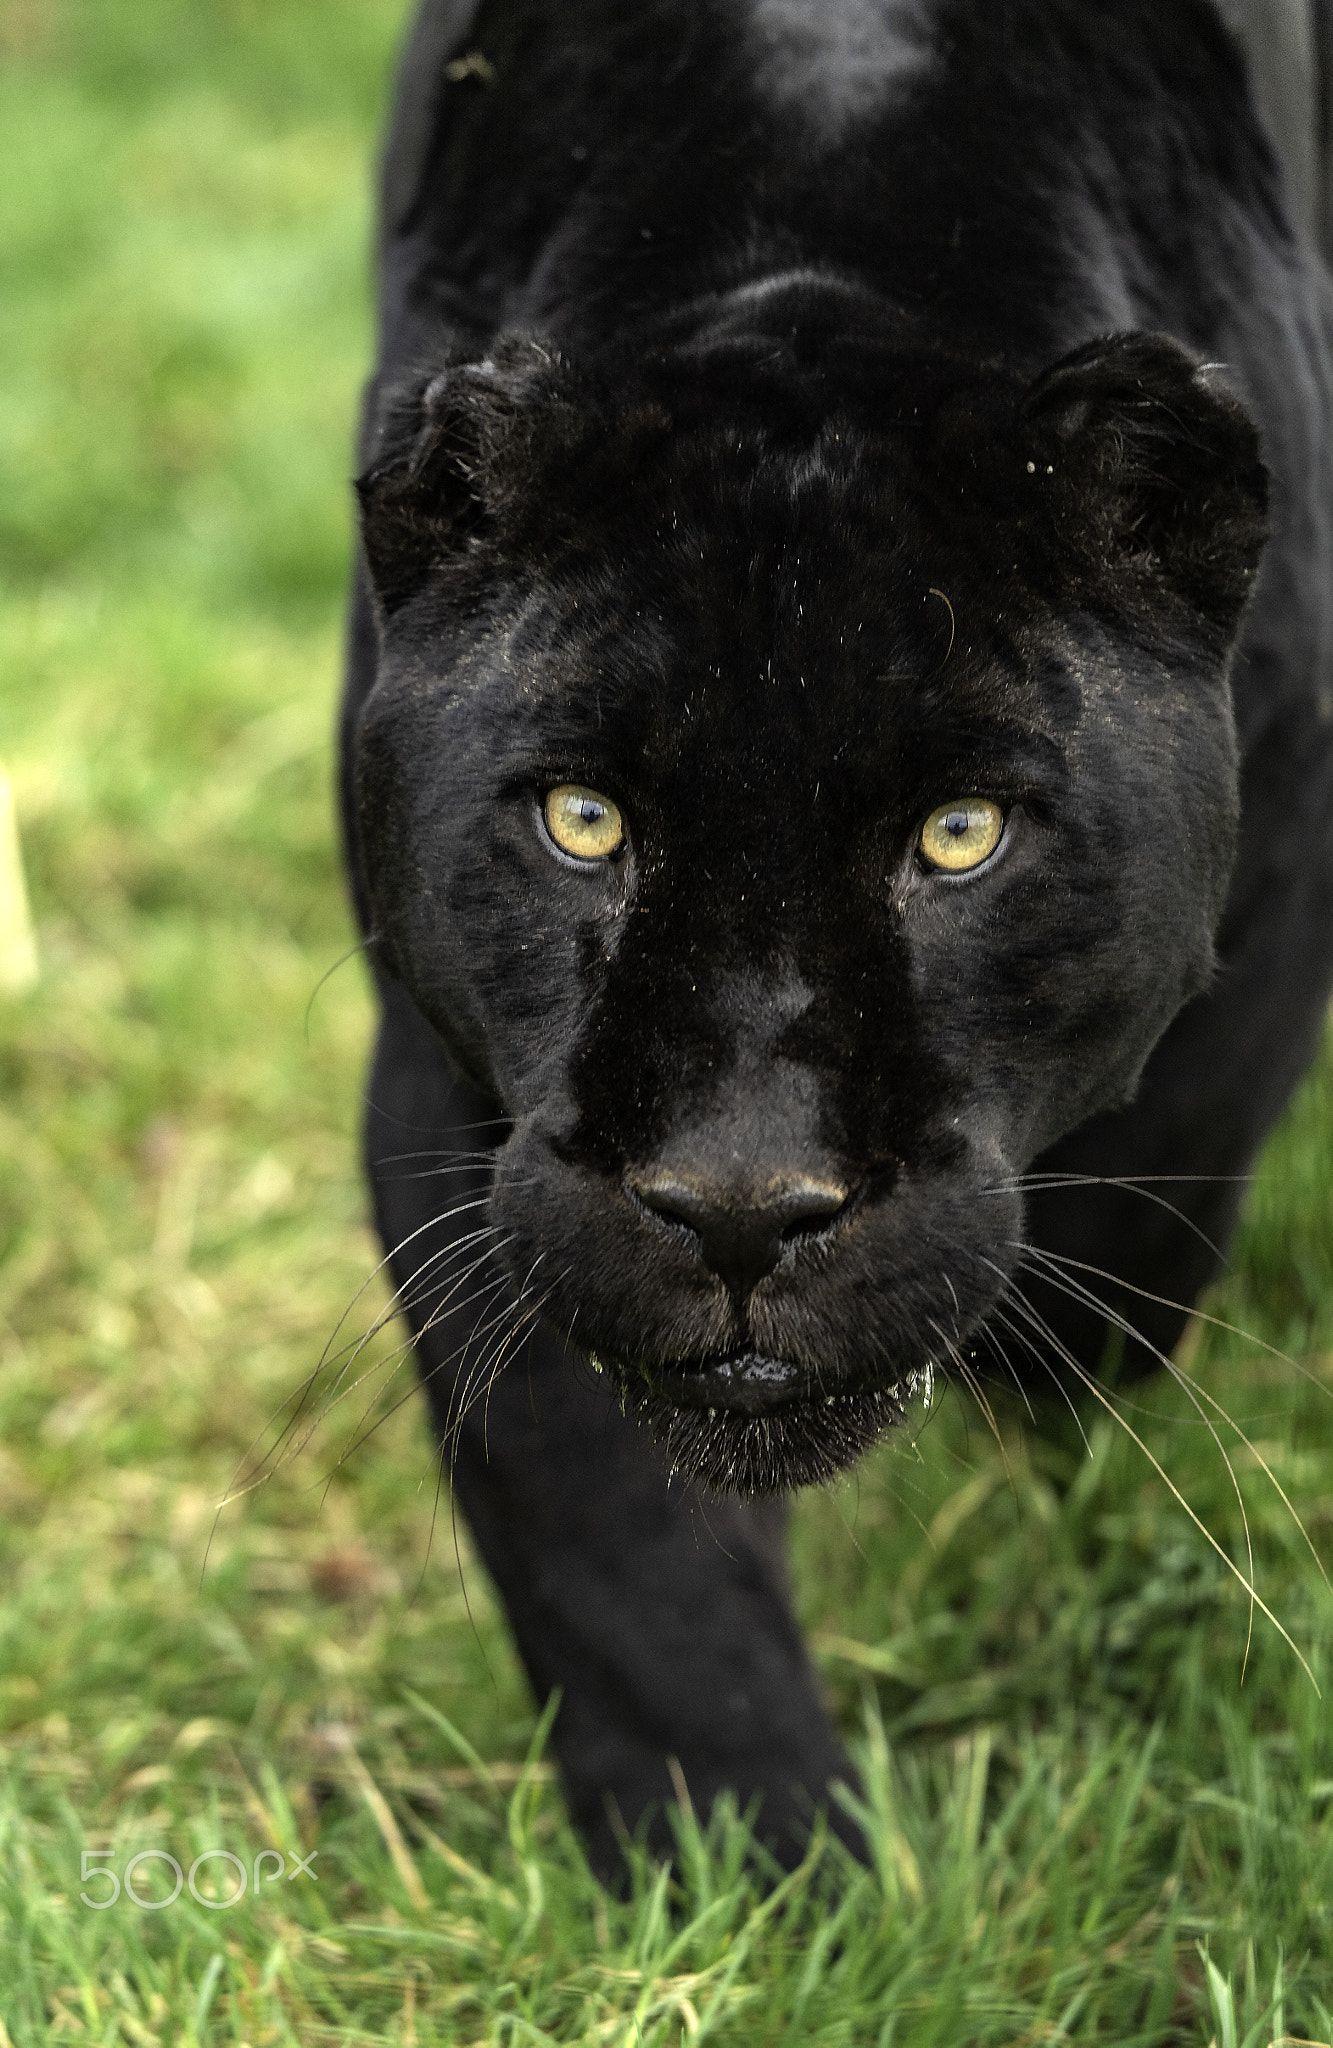 Black Jaguar Black Jaguar Jaguar Black